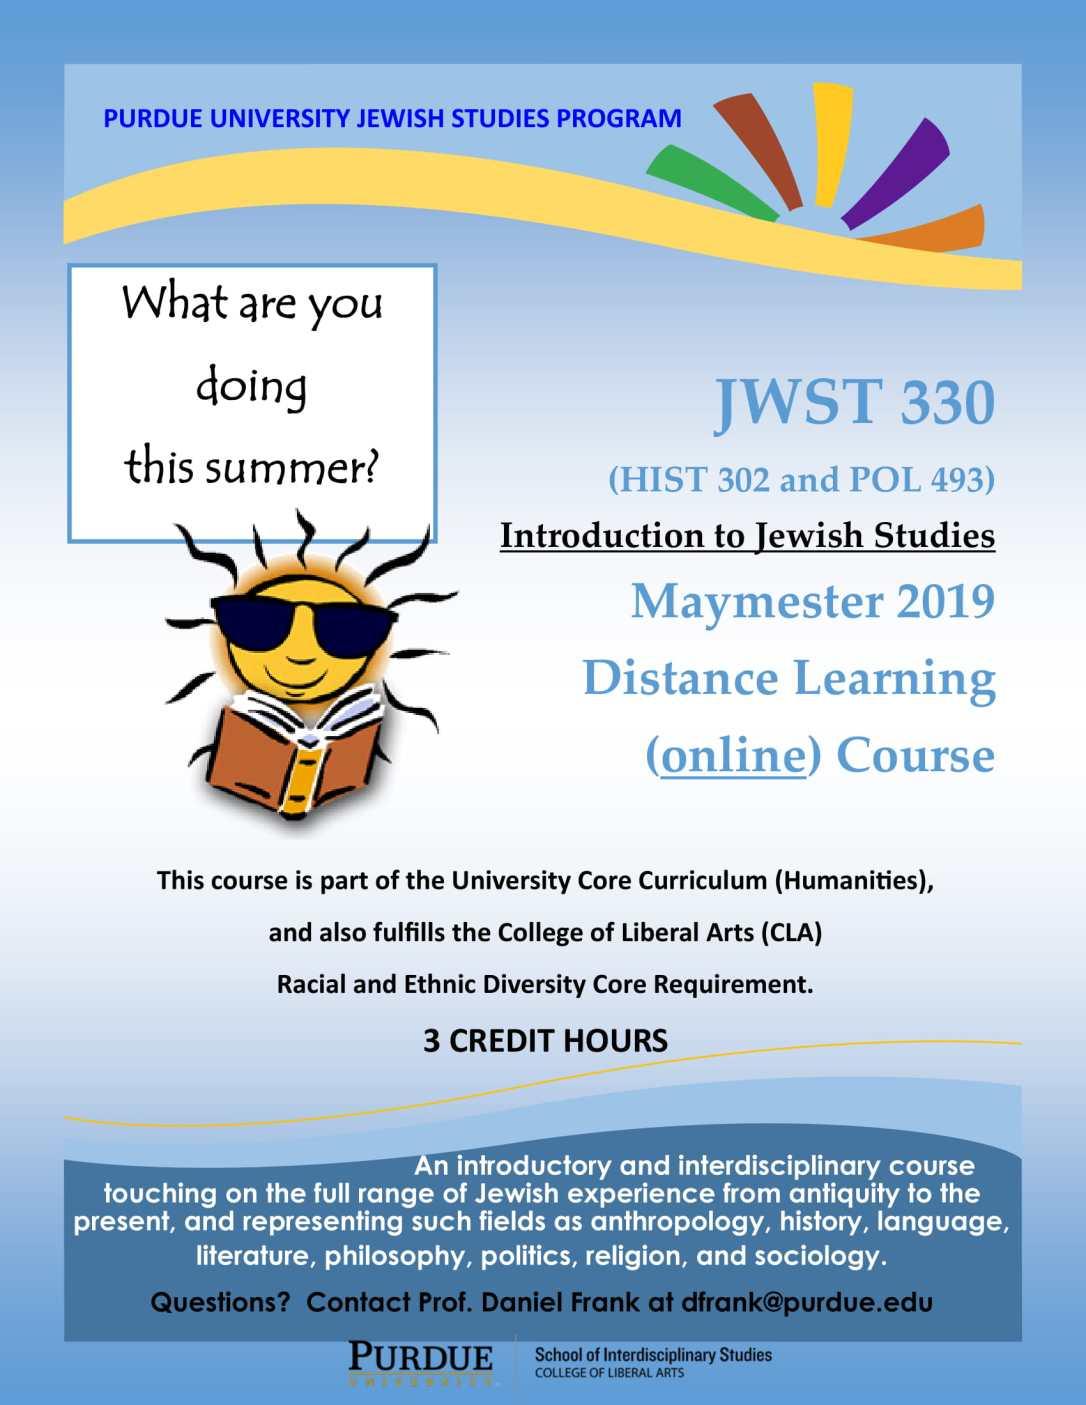 JWST330 distance learning online maymester 2019-1